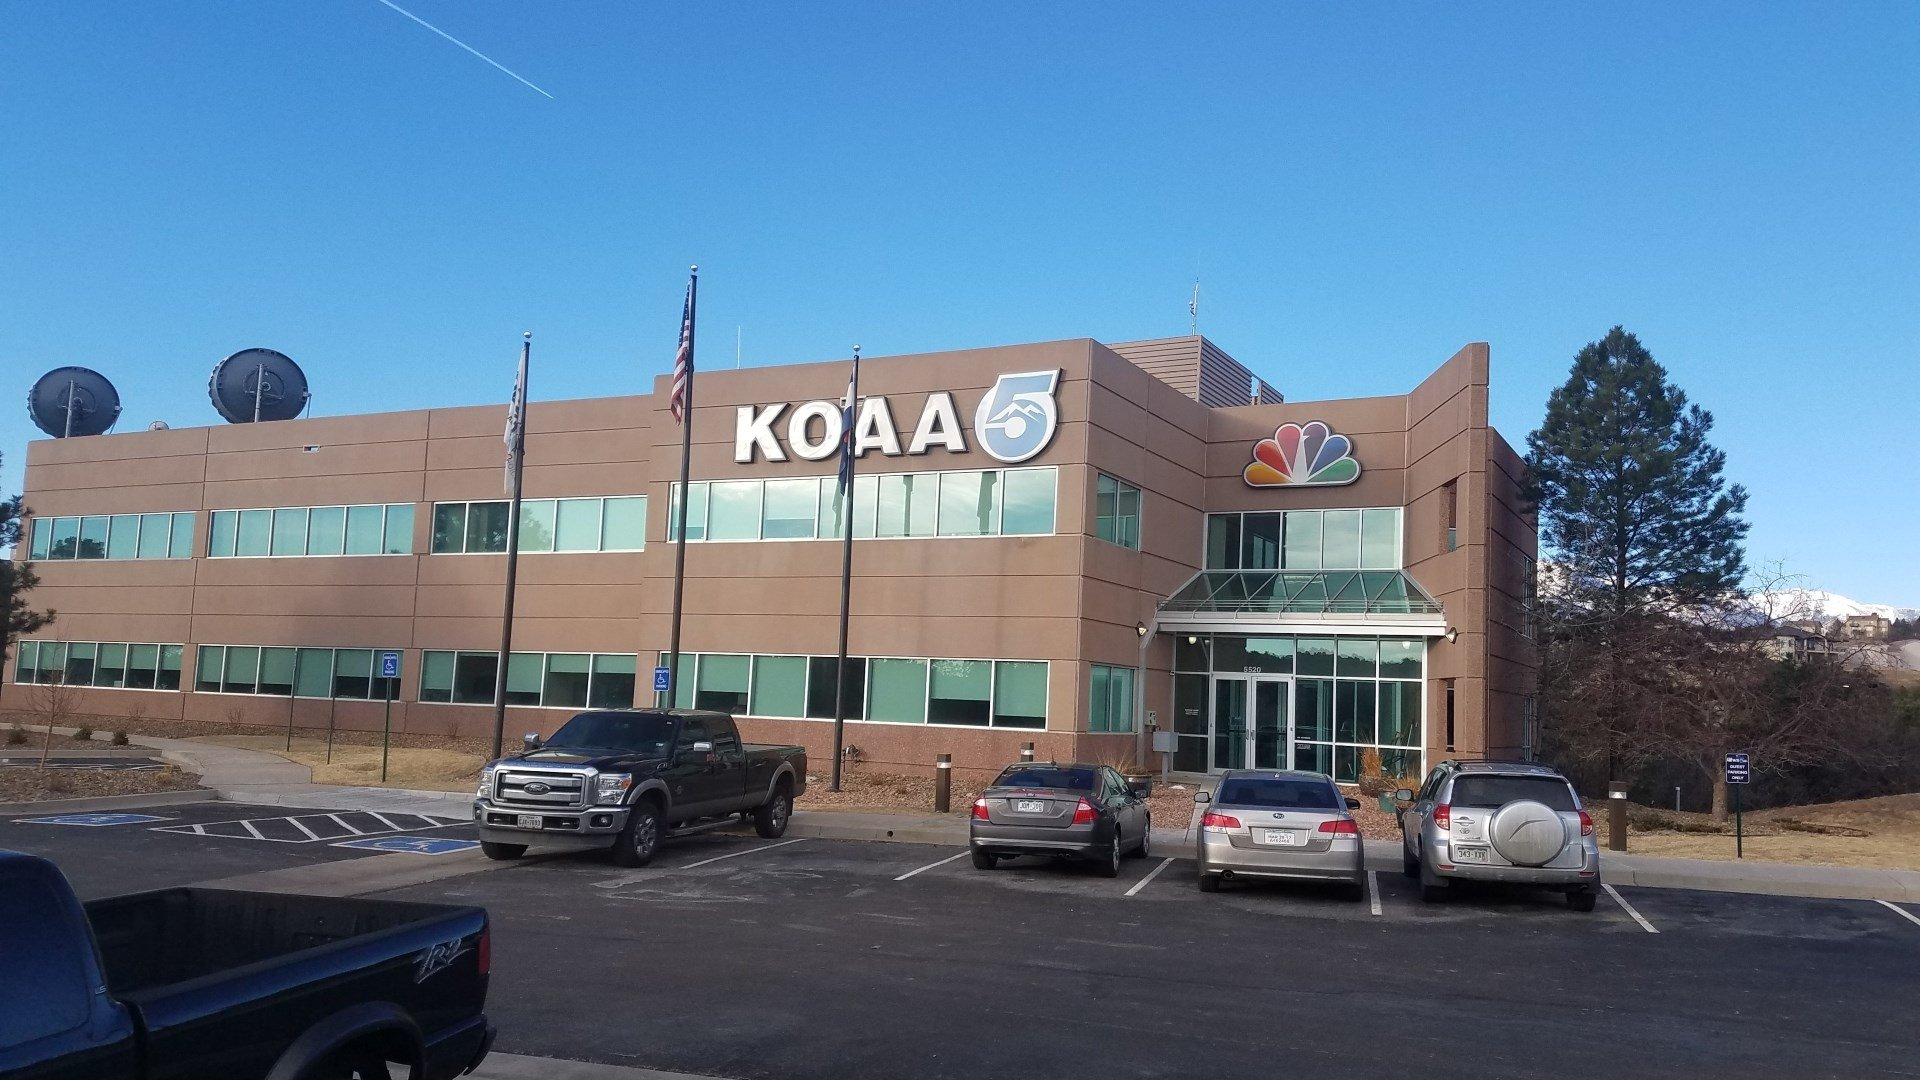 KOAA News 5 studios in Colorado Springs (2017)